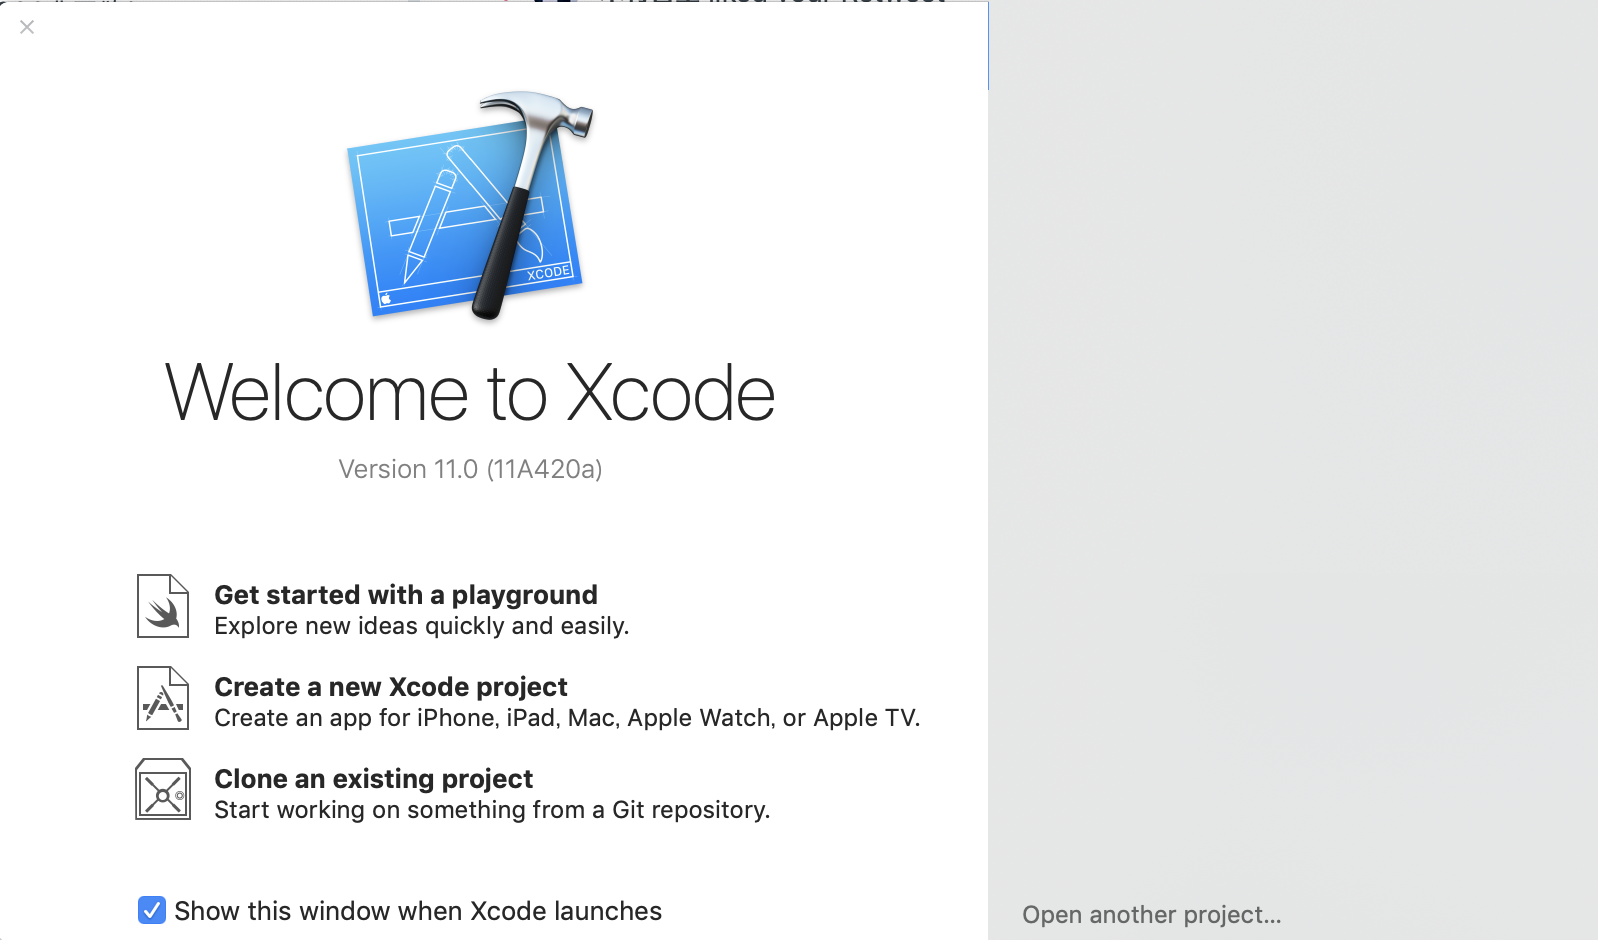 iOSアプリ開発に必要なXcodeについて知ろう